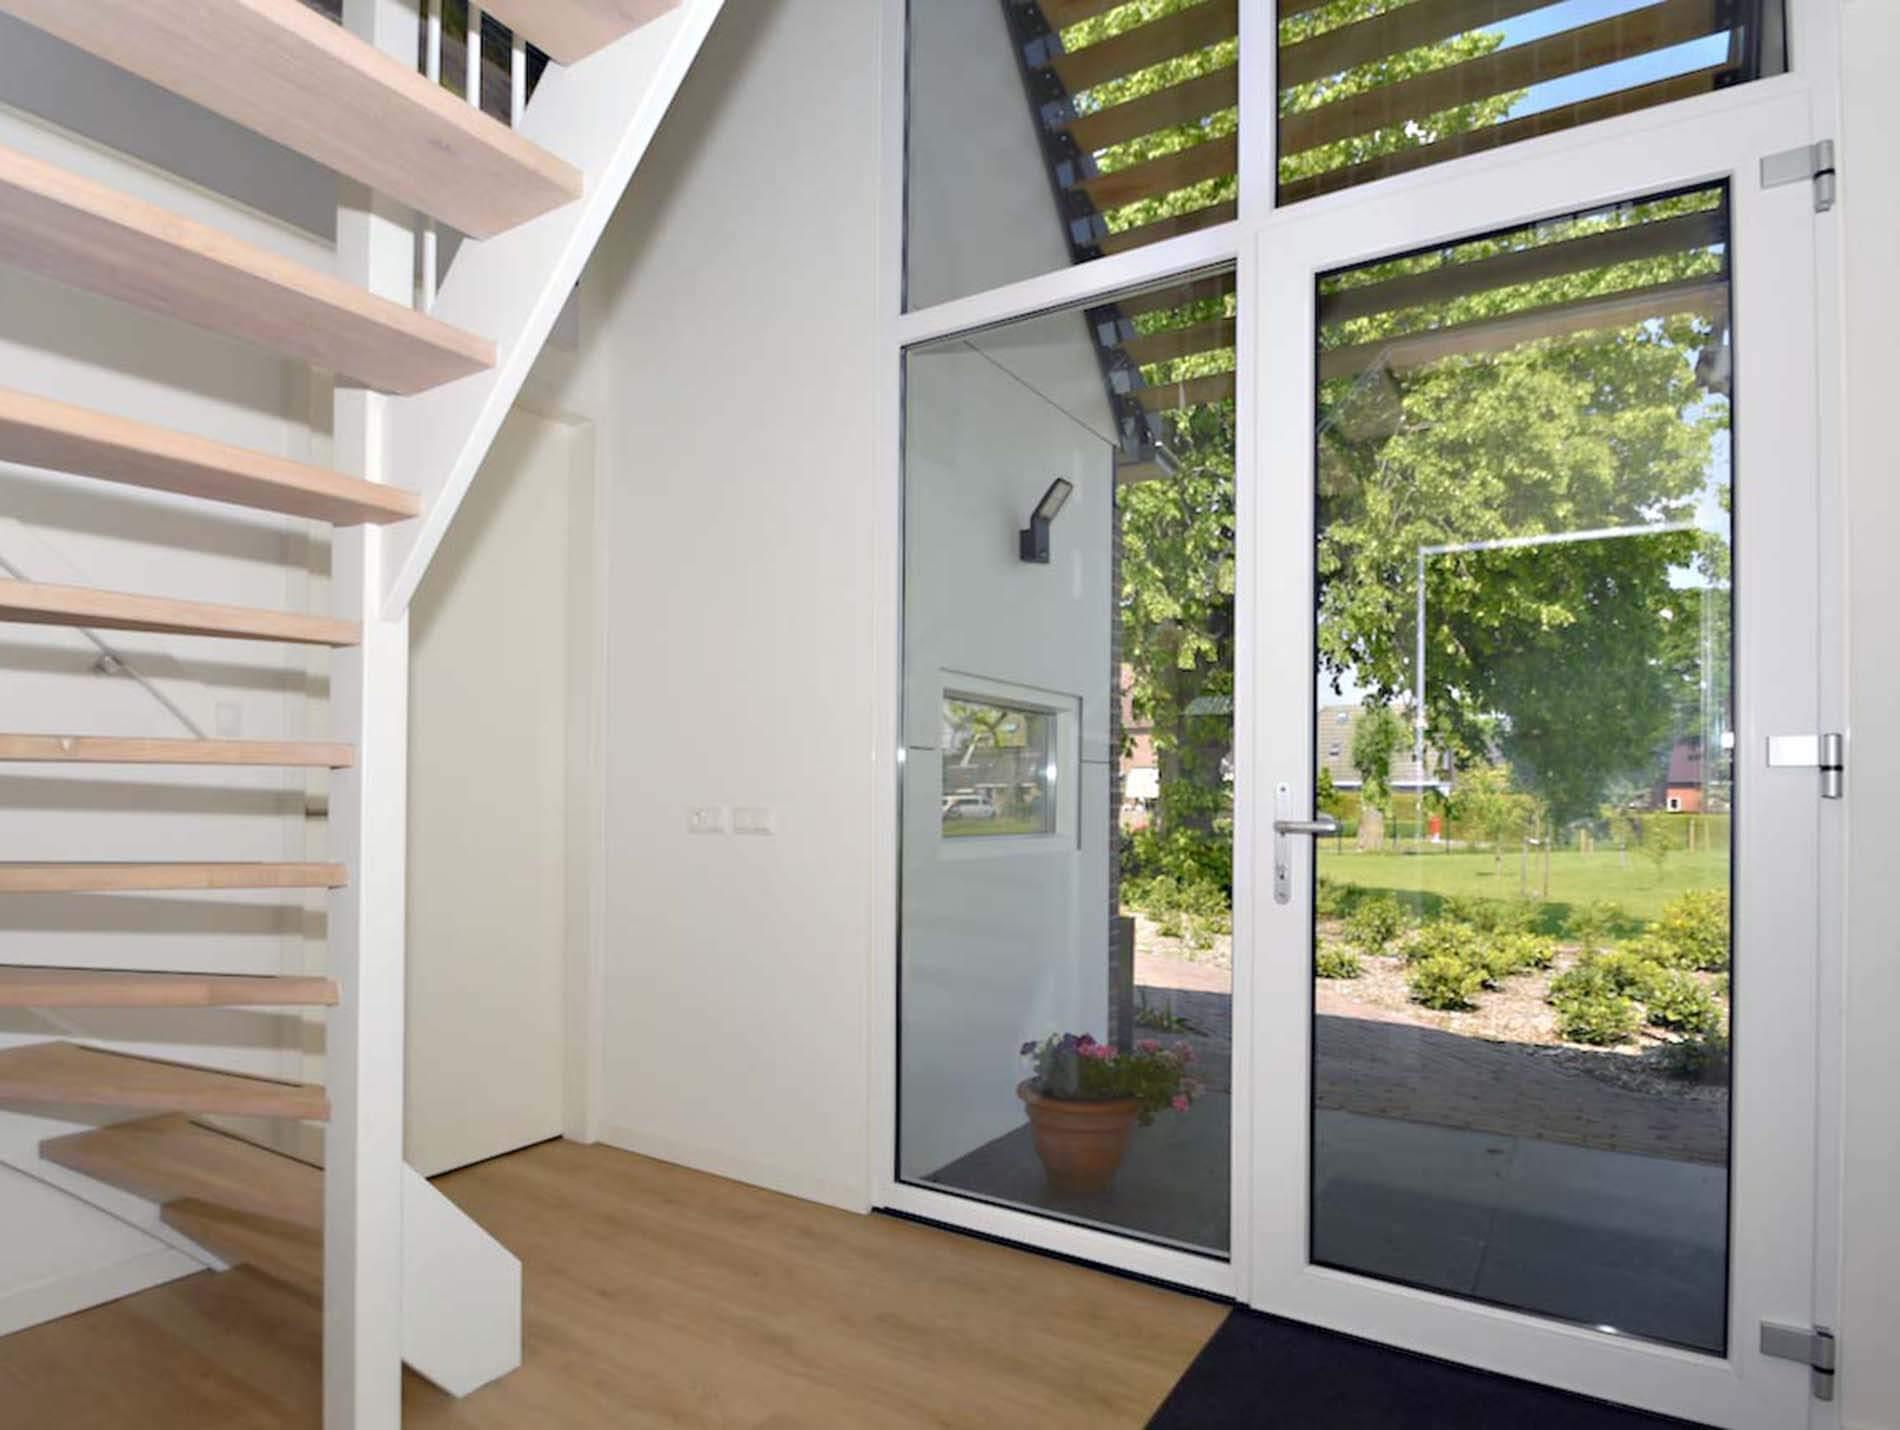 6. interieur-Wijnjewouden-particuliere-woning-1900x1430p.jpg